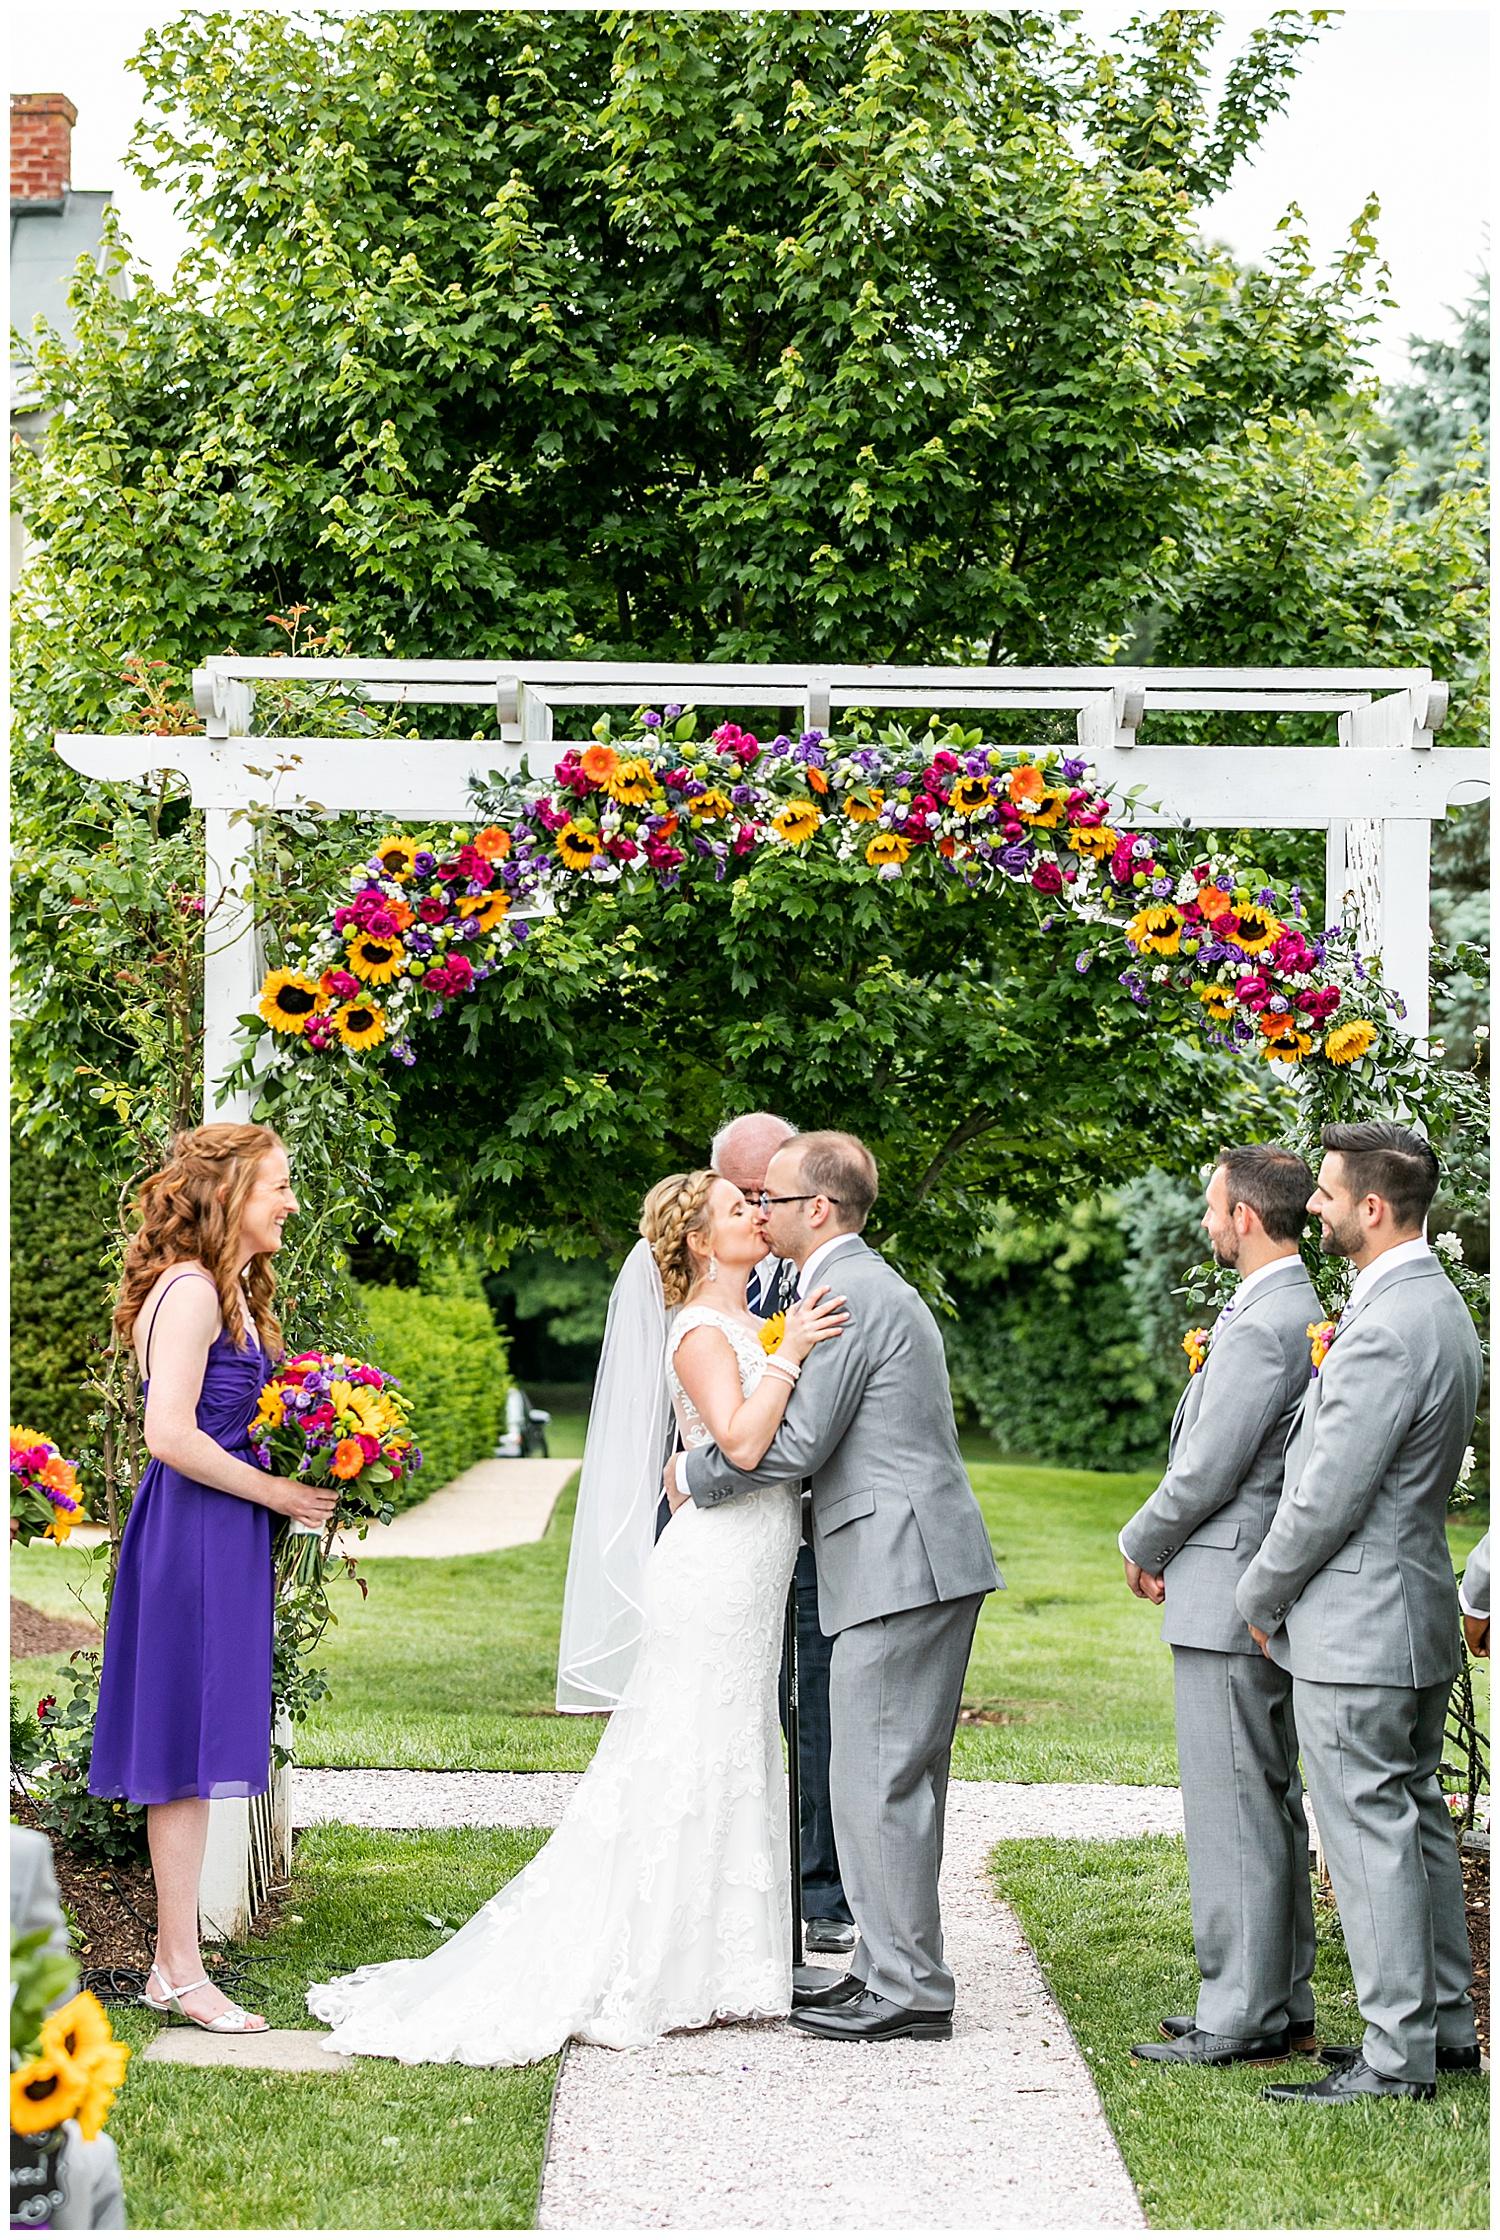 Michelle Shaun Antrim 1844 Wedding Living Radiant Photography photos_0136.jpg